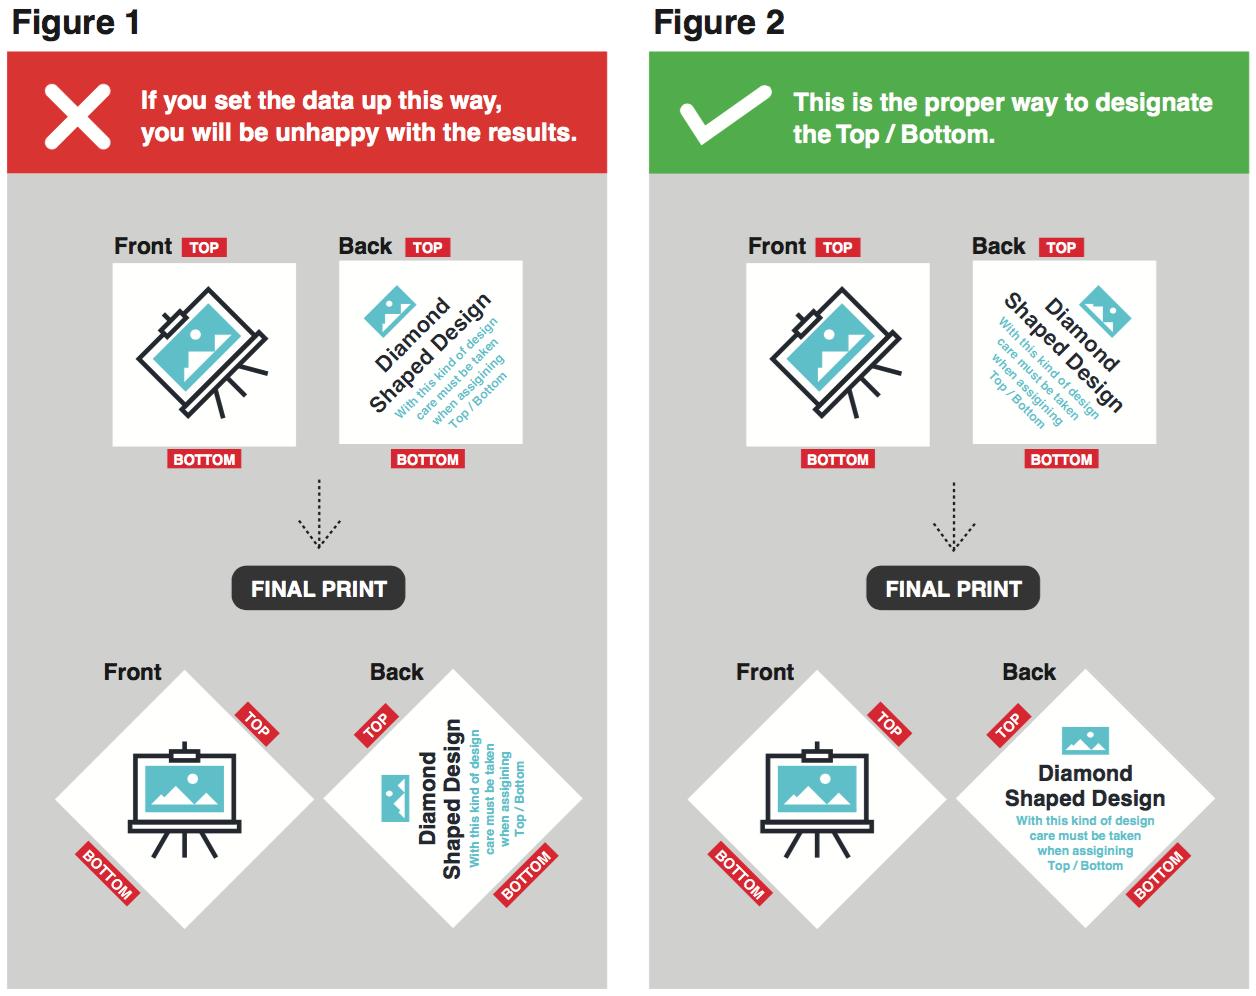 Orientation - Front & Back Data Orientation 02 Image